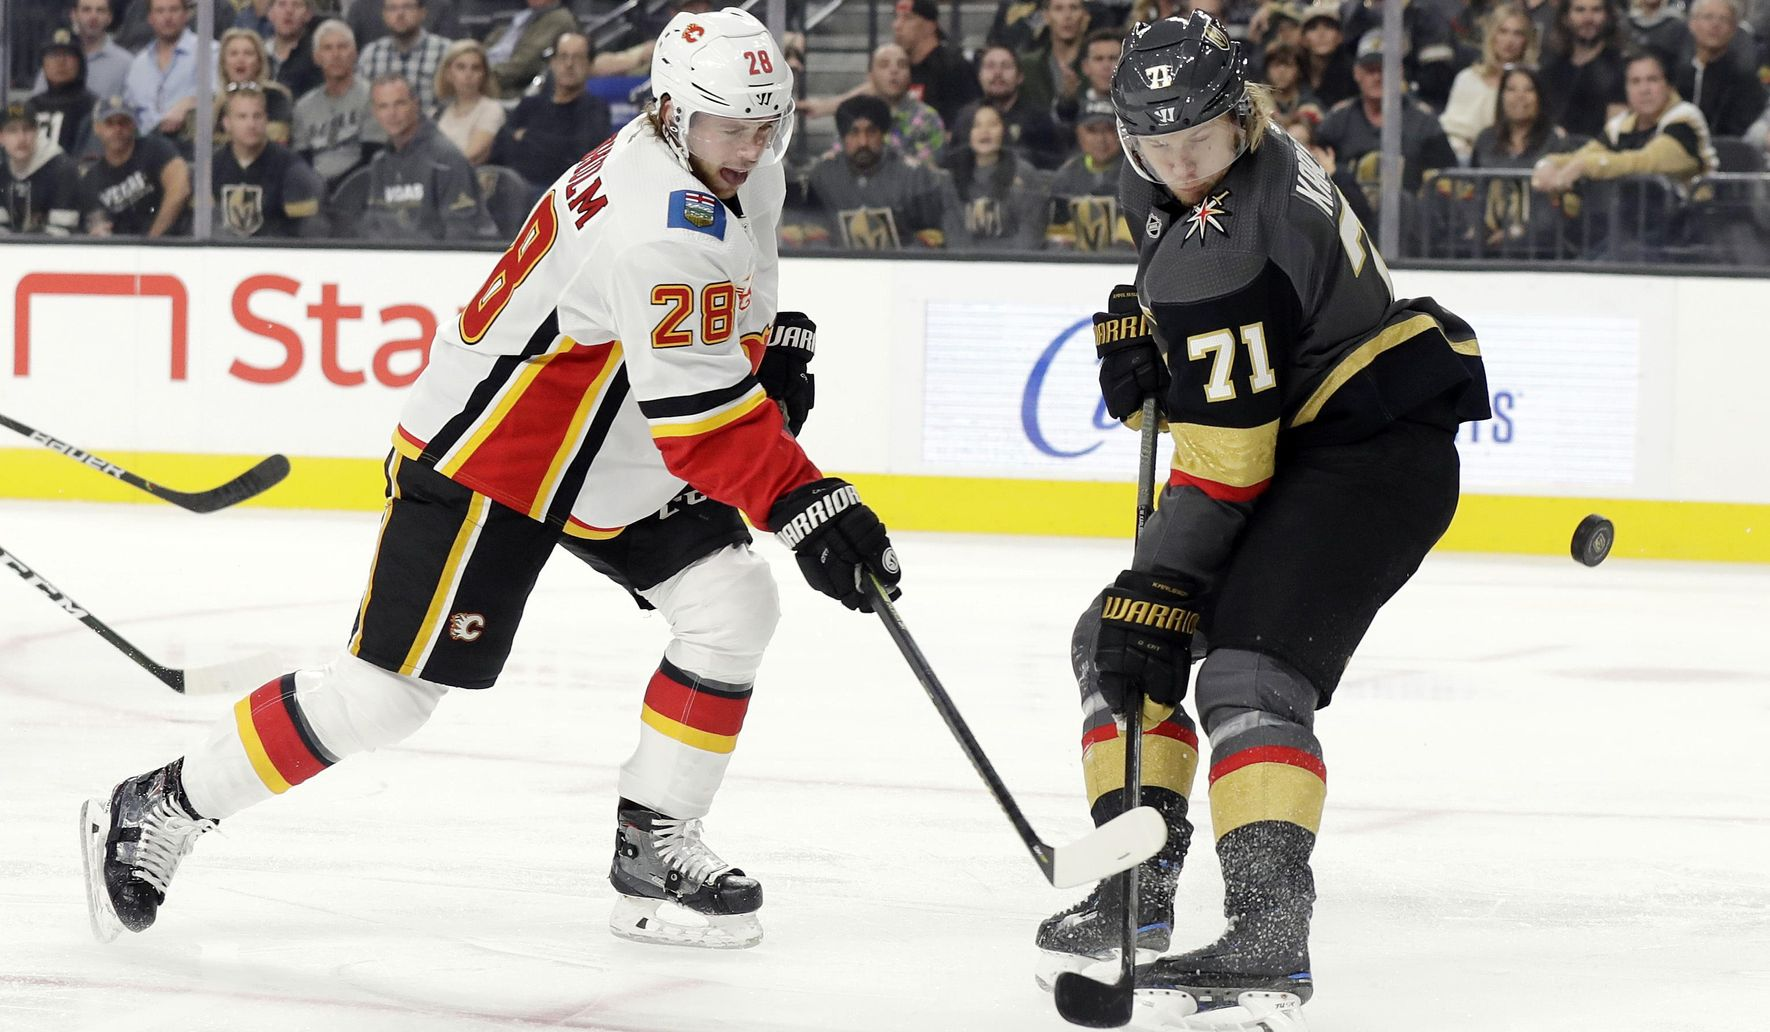 Flames_golden_knights_hockey_88102_c0-115-3064-1901_s1770x1032